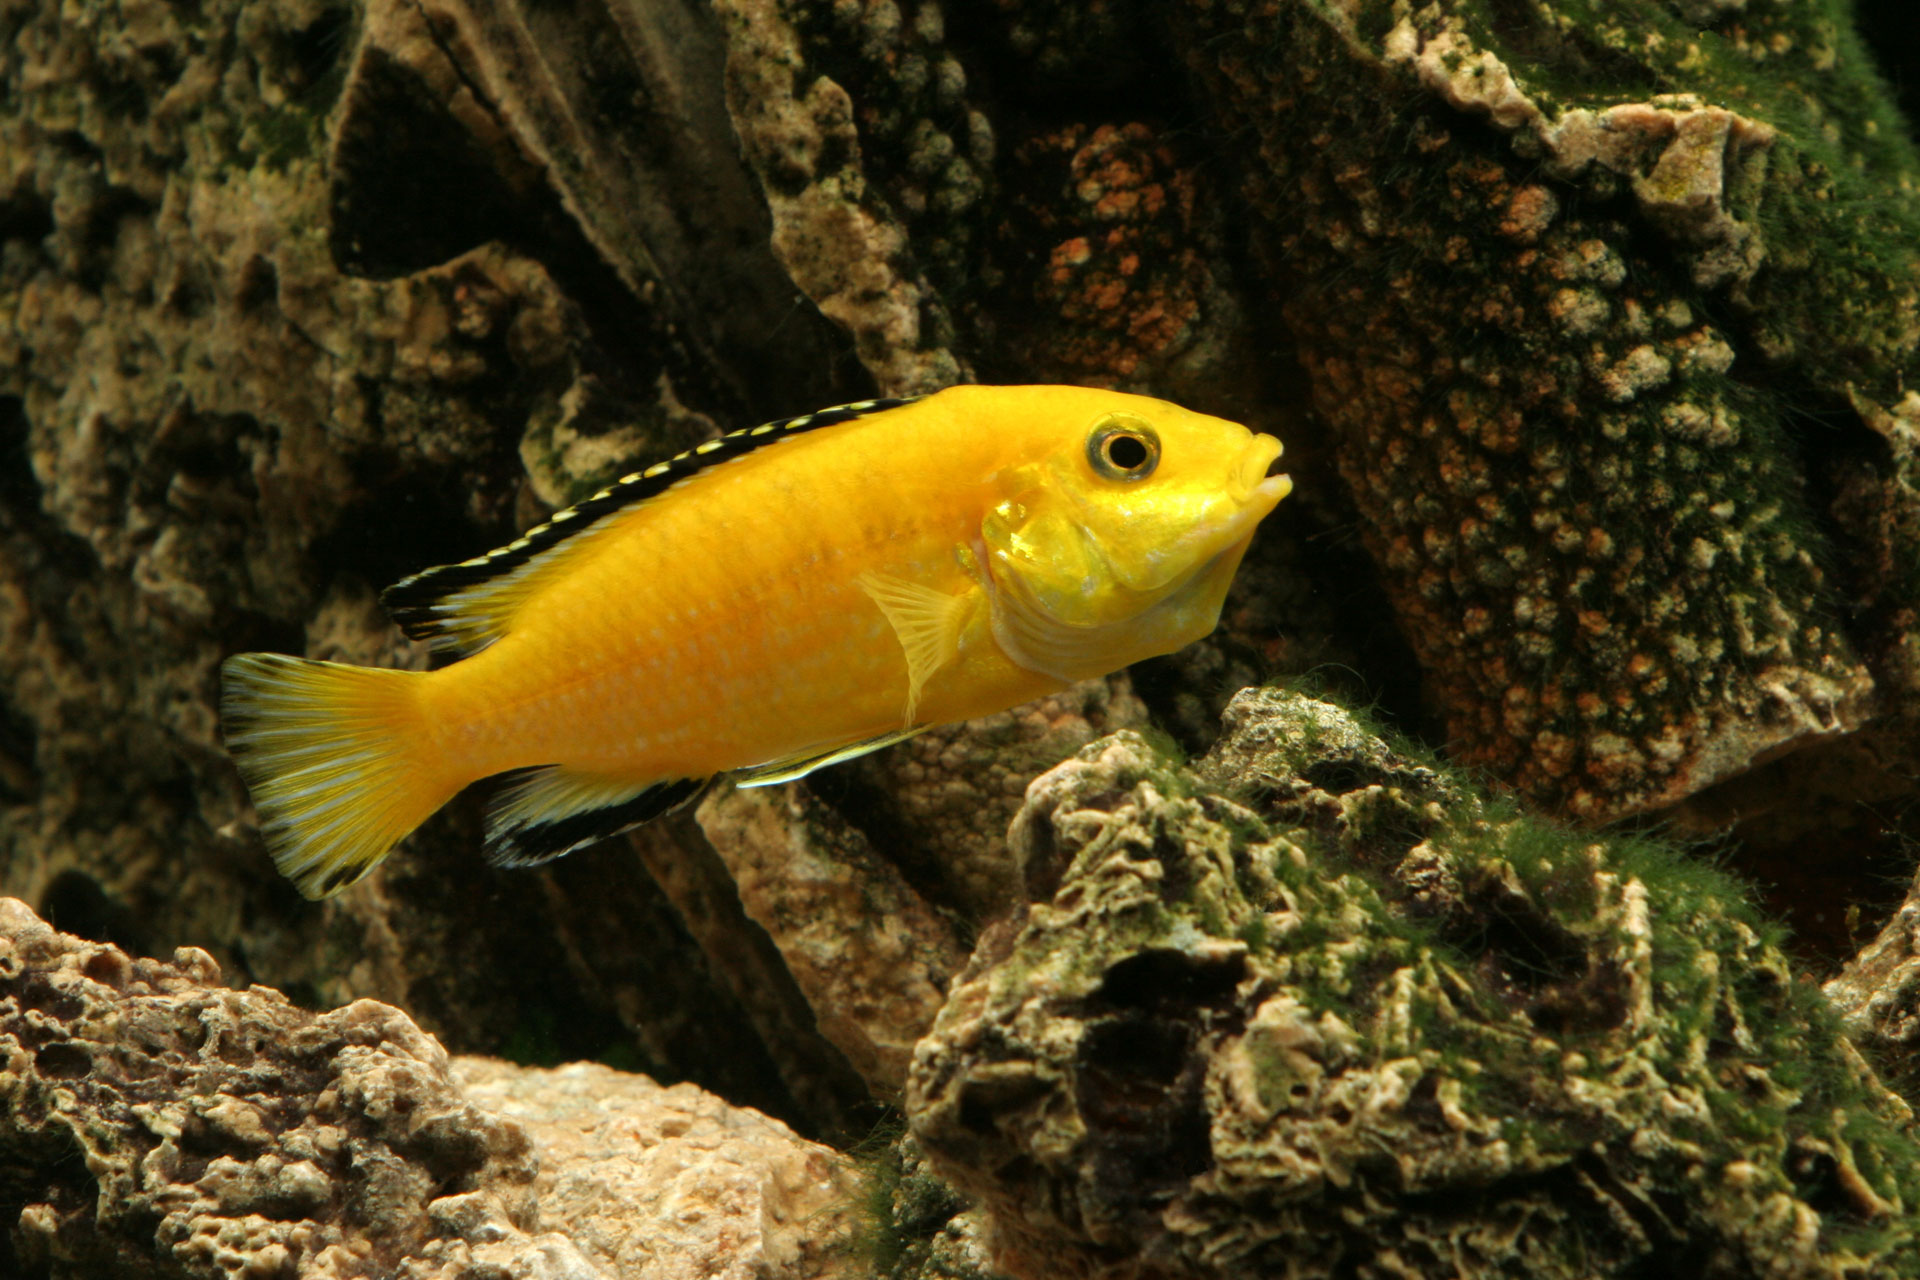 Electric Yellow Labidochromis African Cichlid